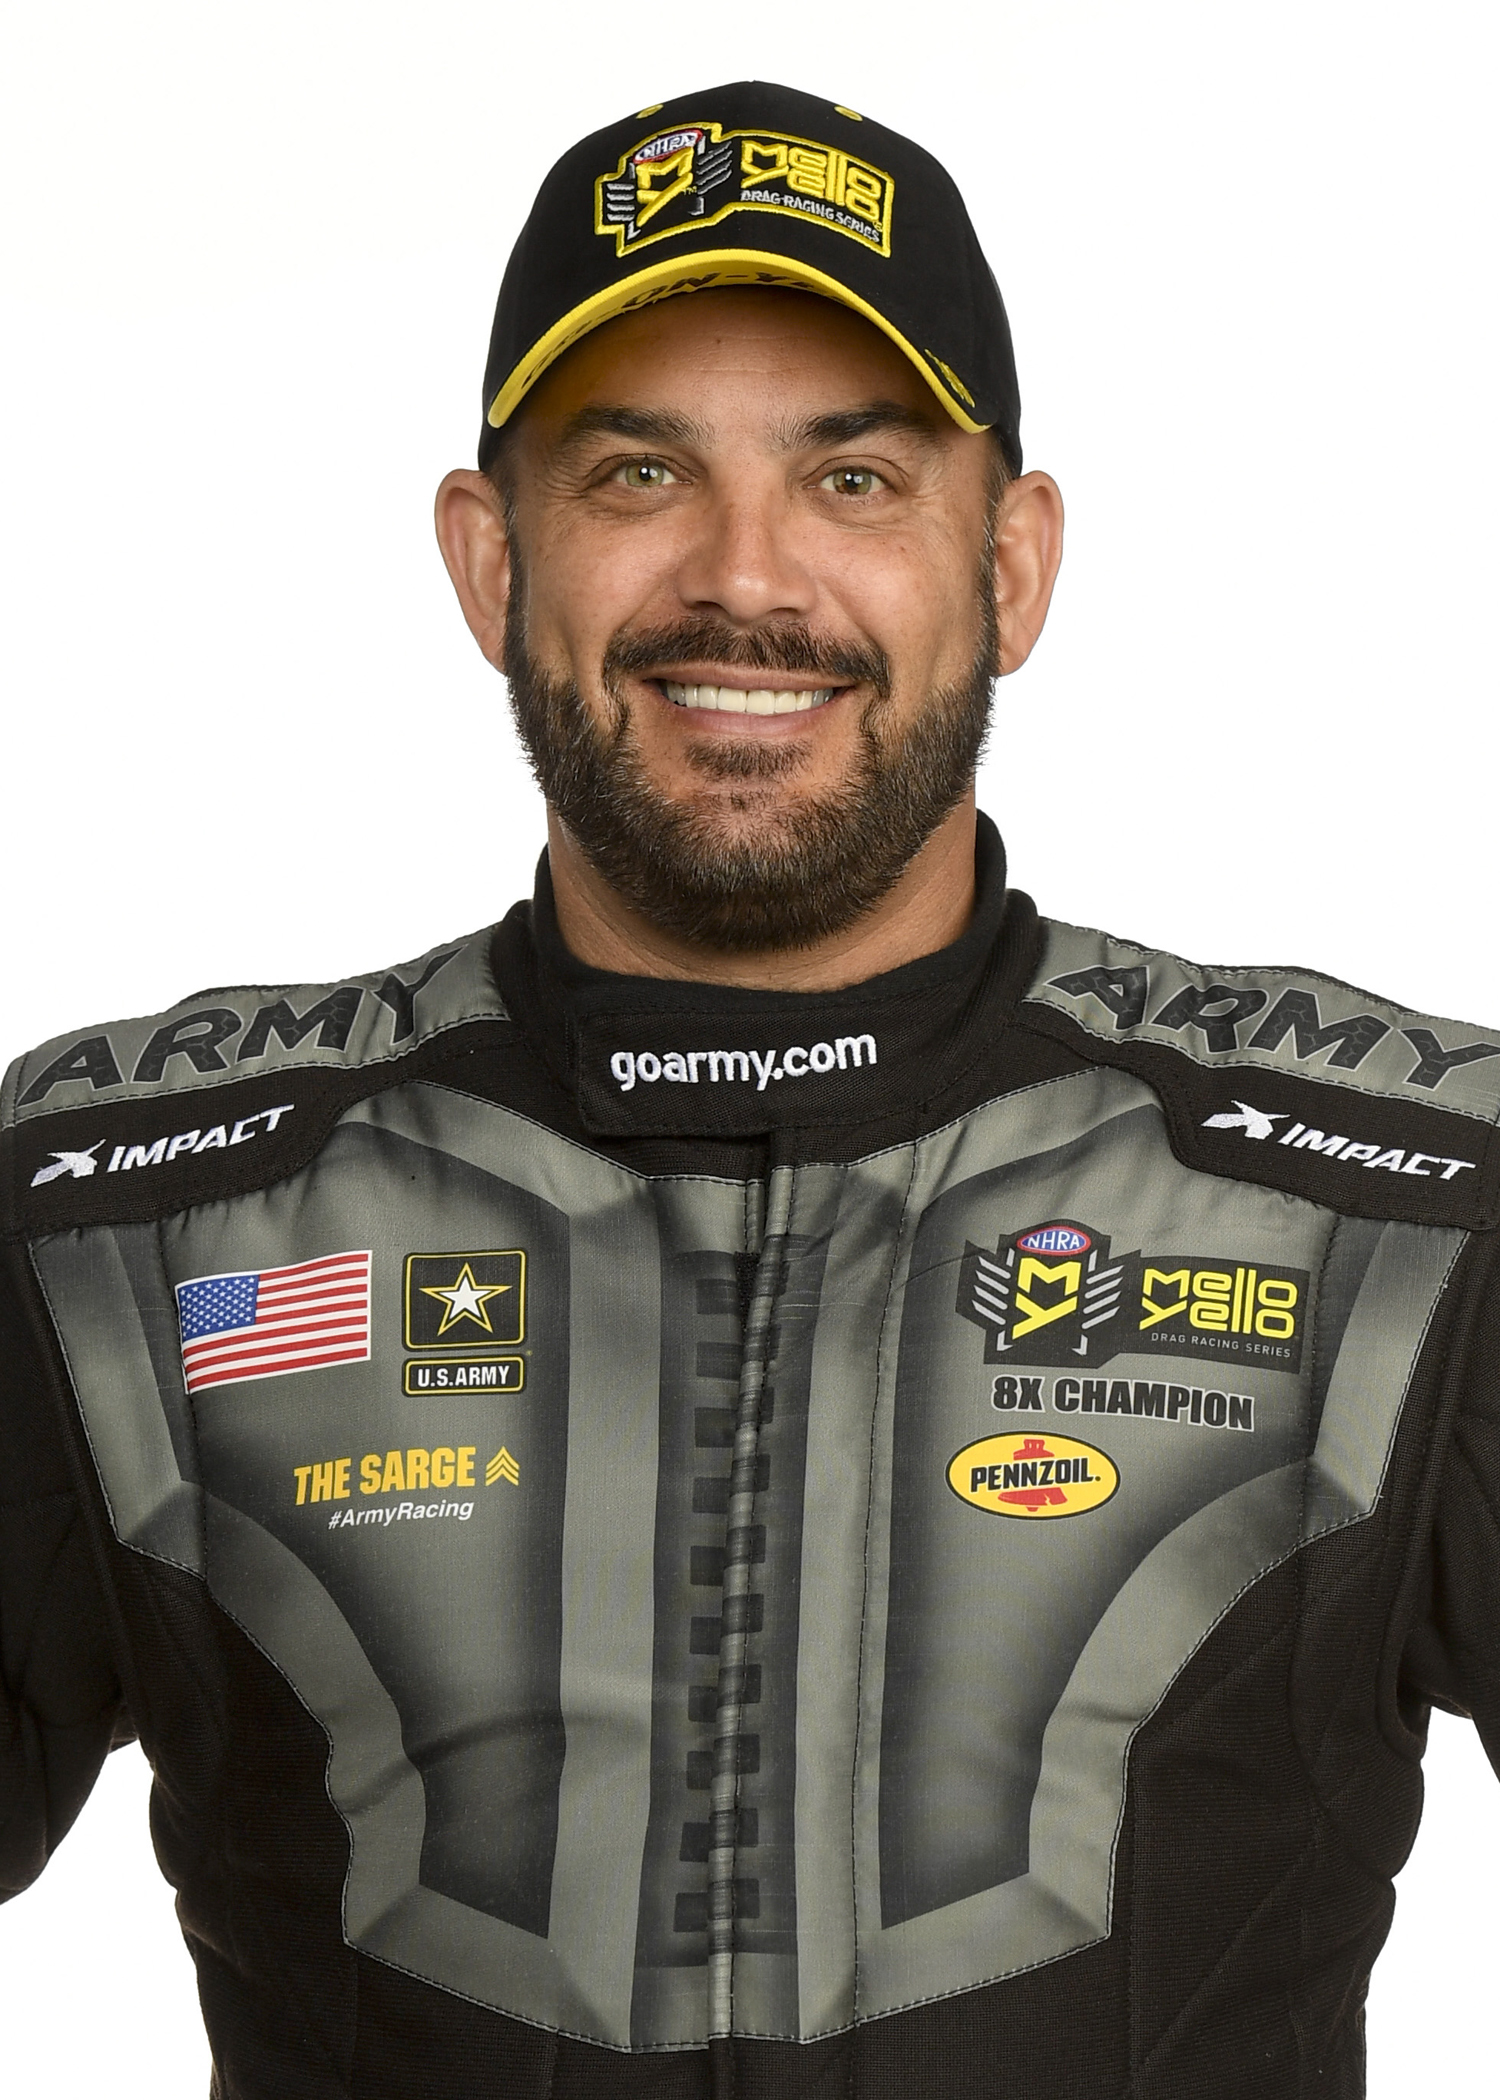 NHRA Top Fuel Champ Tony Schumacher